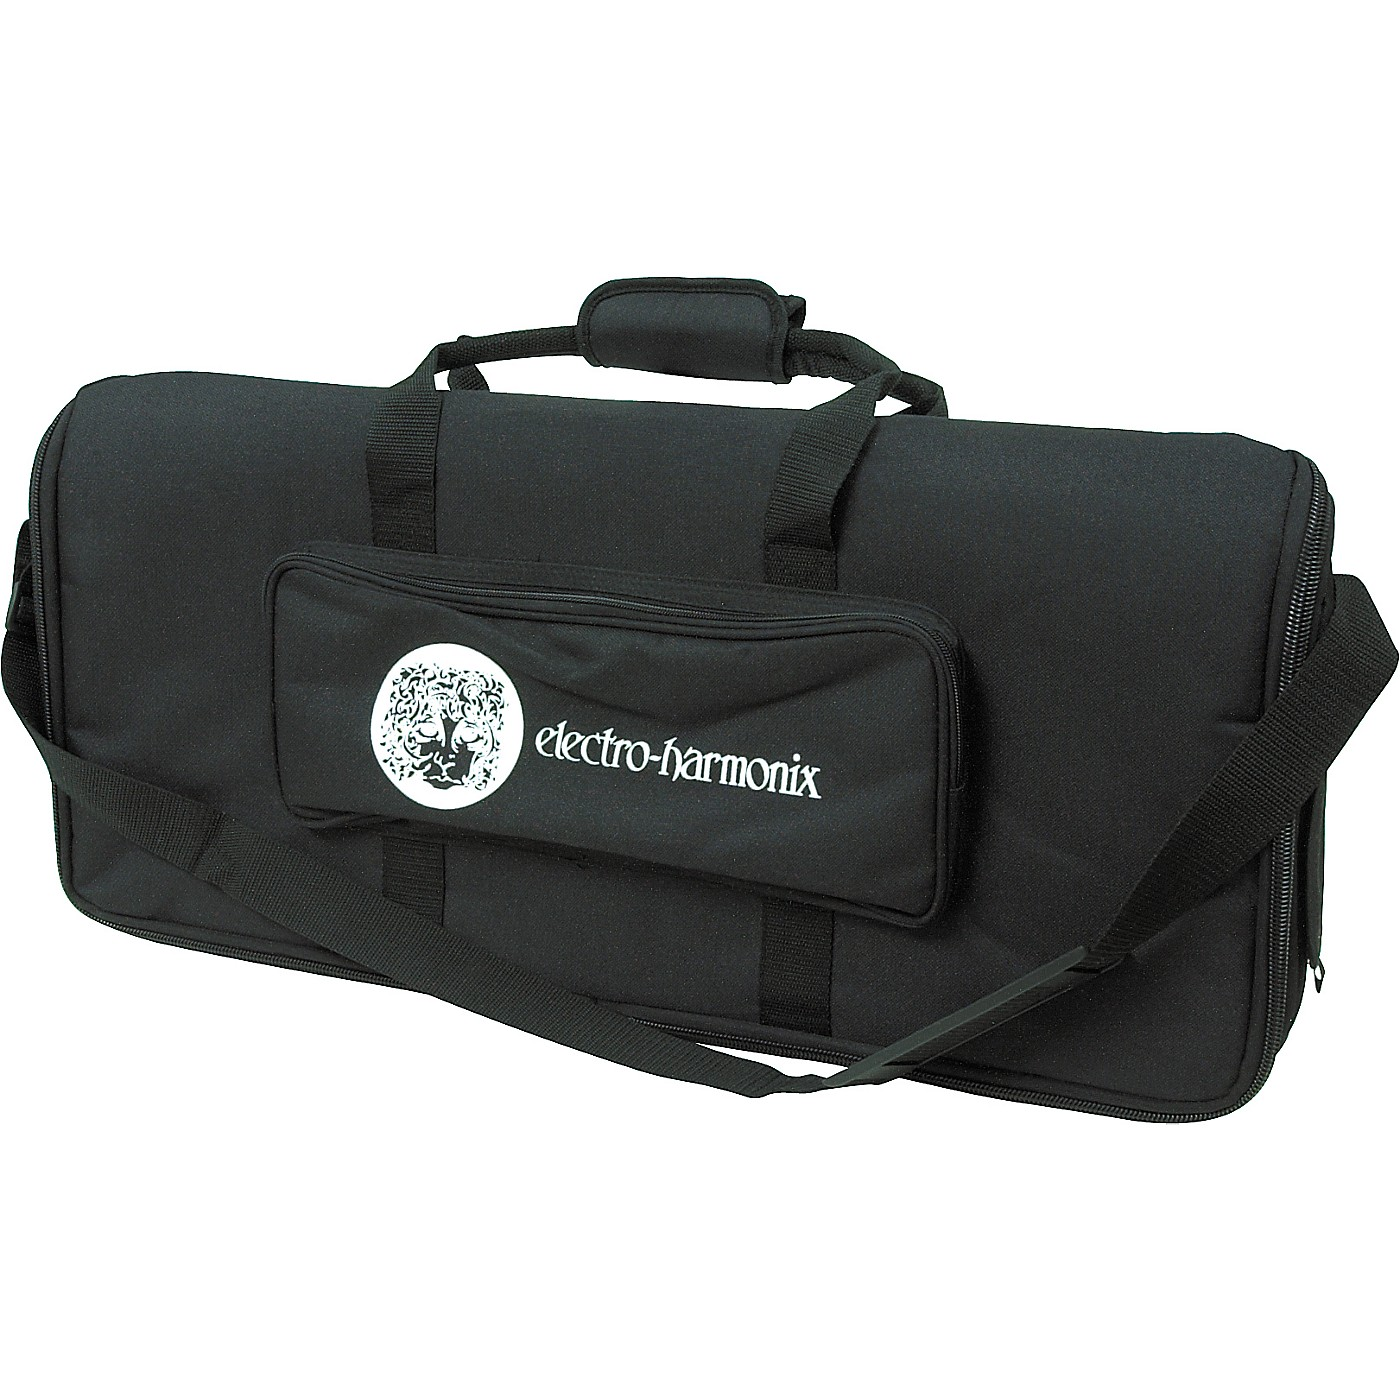 Electro-Harmonix Pedal Bag thumbnail